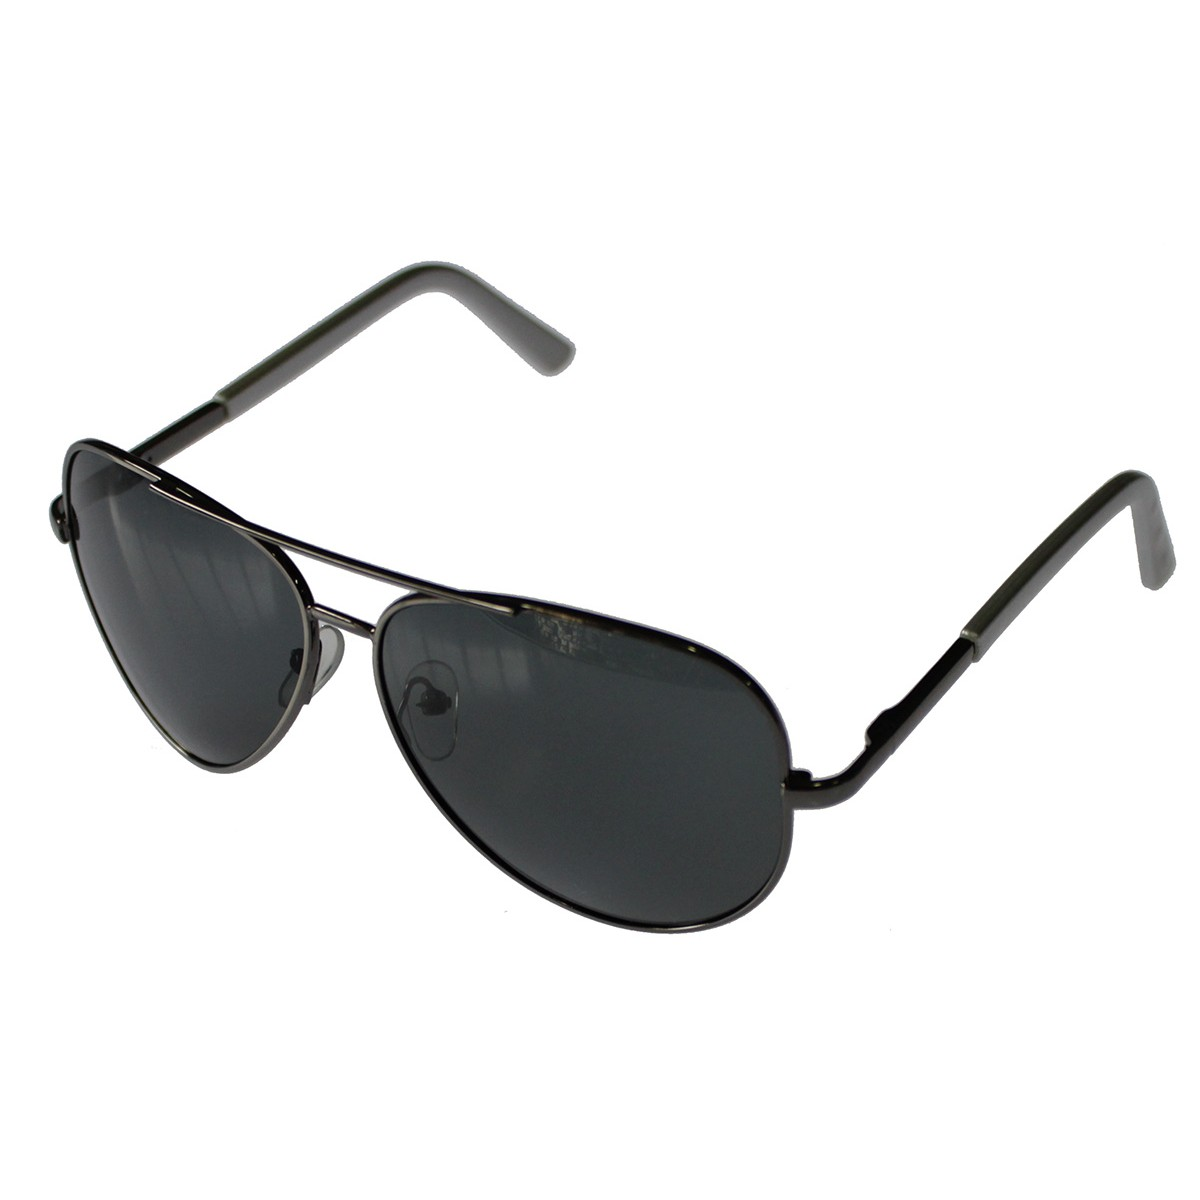 Поляризиращи риболовни очила мод. 8221-2